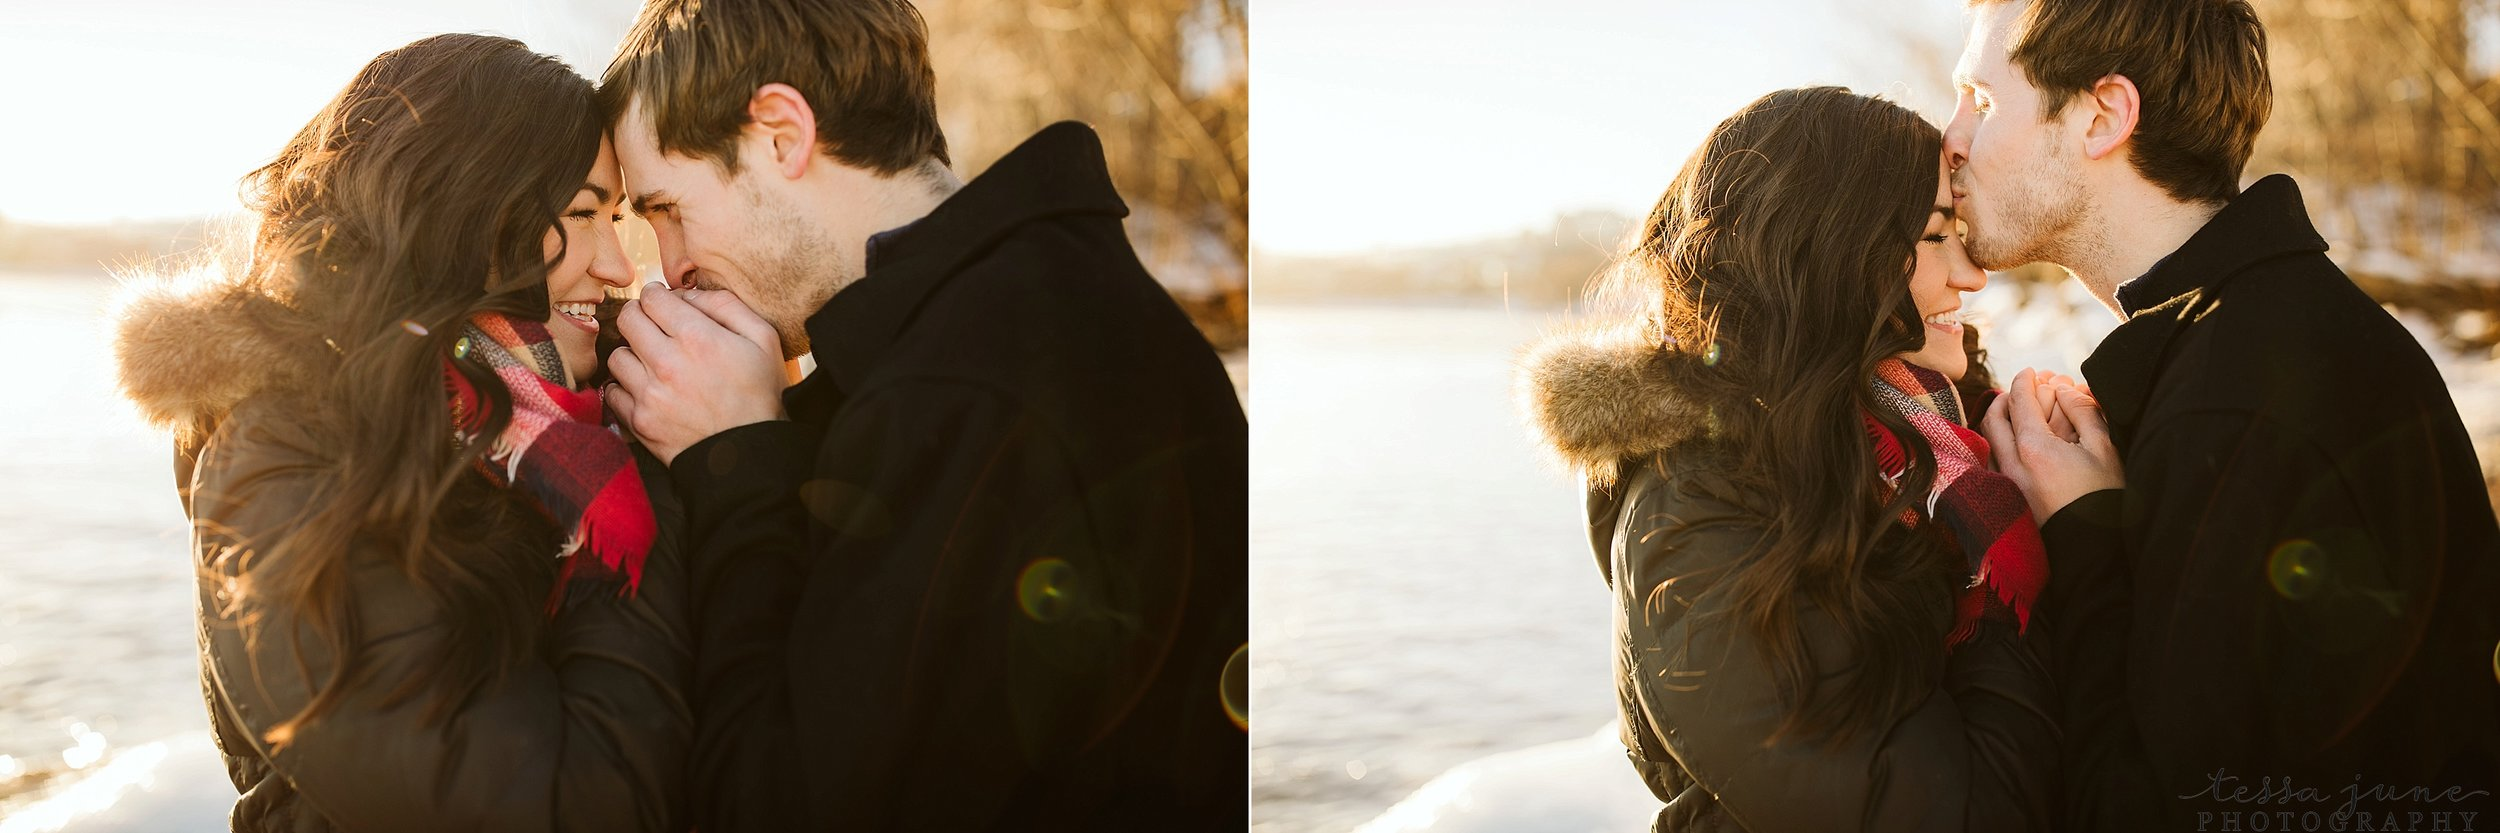 winter-duluth-engagement-at-park-pointe-snow-aly-alex-25.jpg